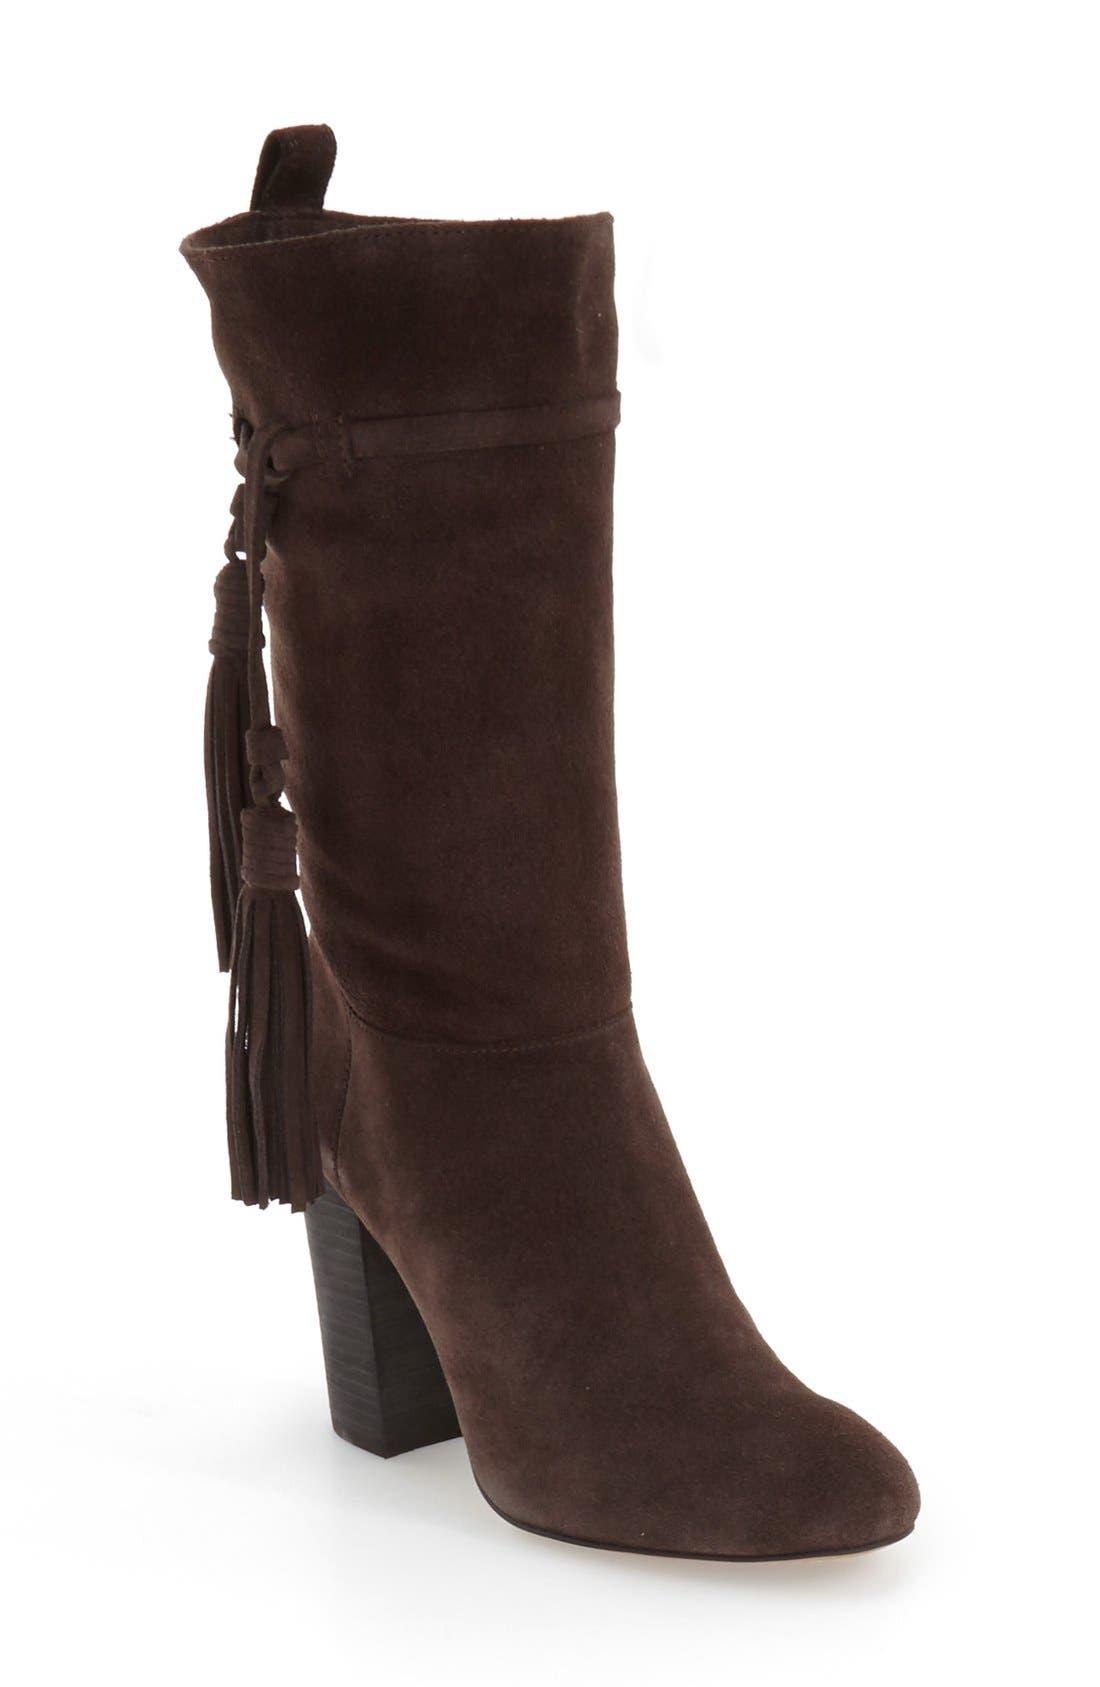 Main Image - Vince Camuto 'Fermel' Slouch Tassel Boot (Women)